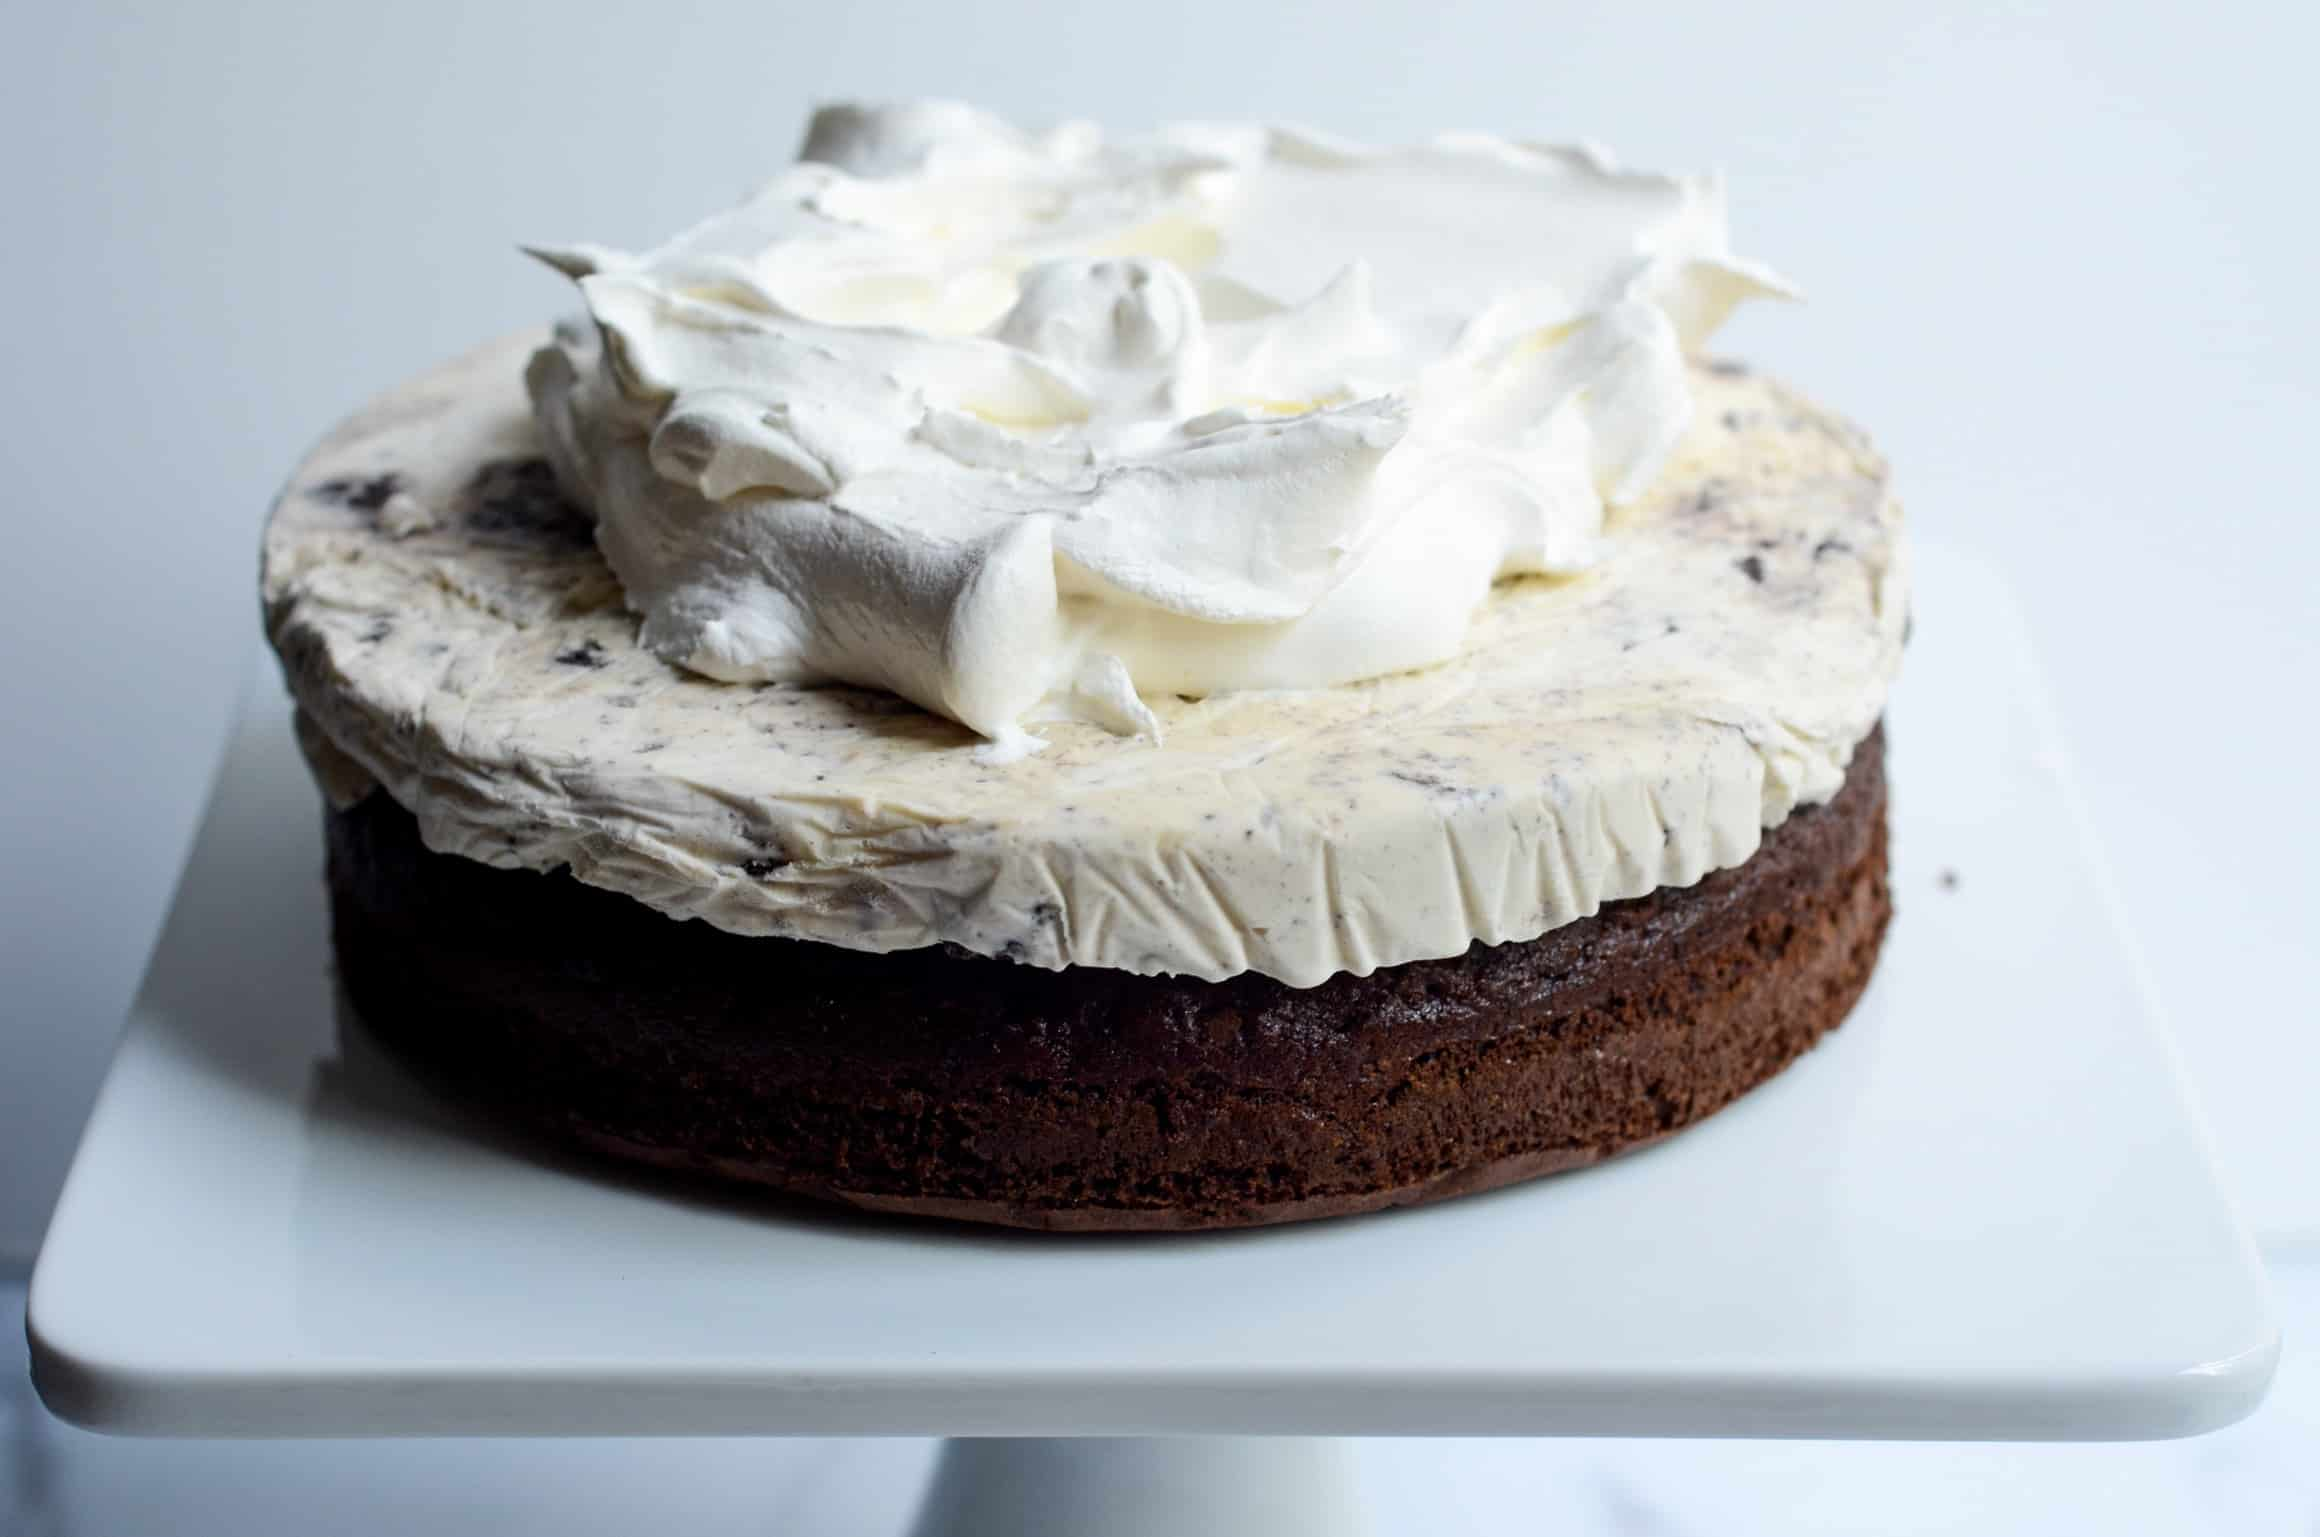 deconstructed cookies and cream ice cream cake